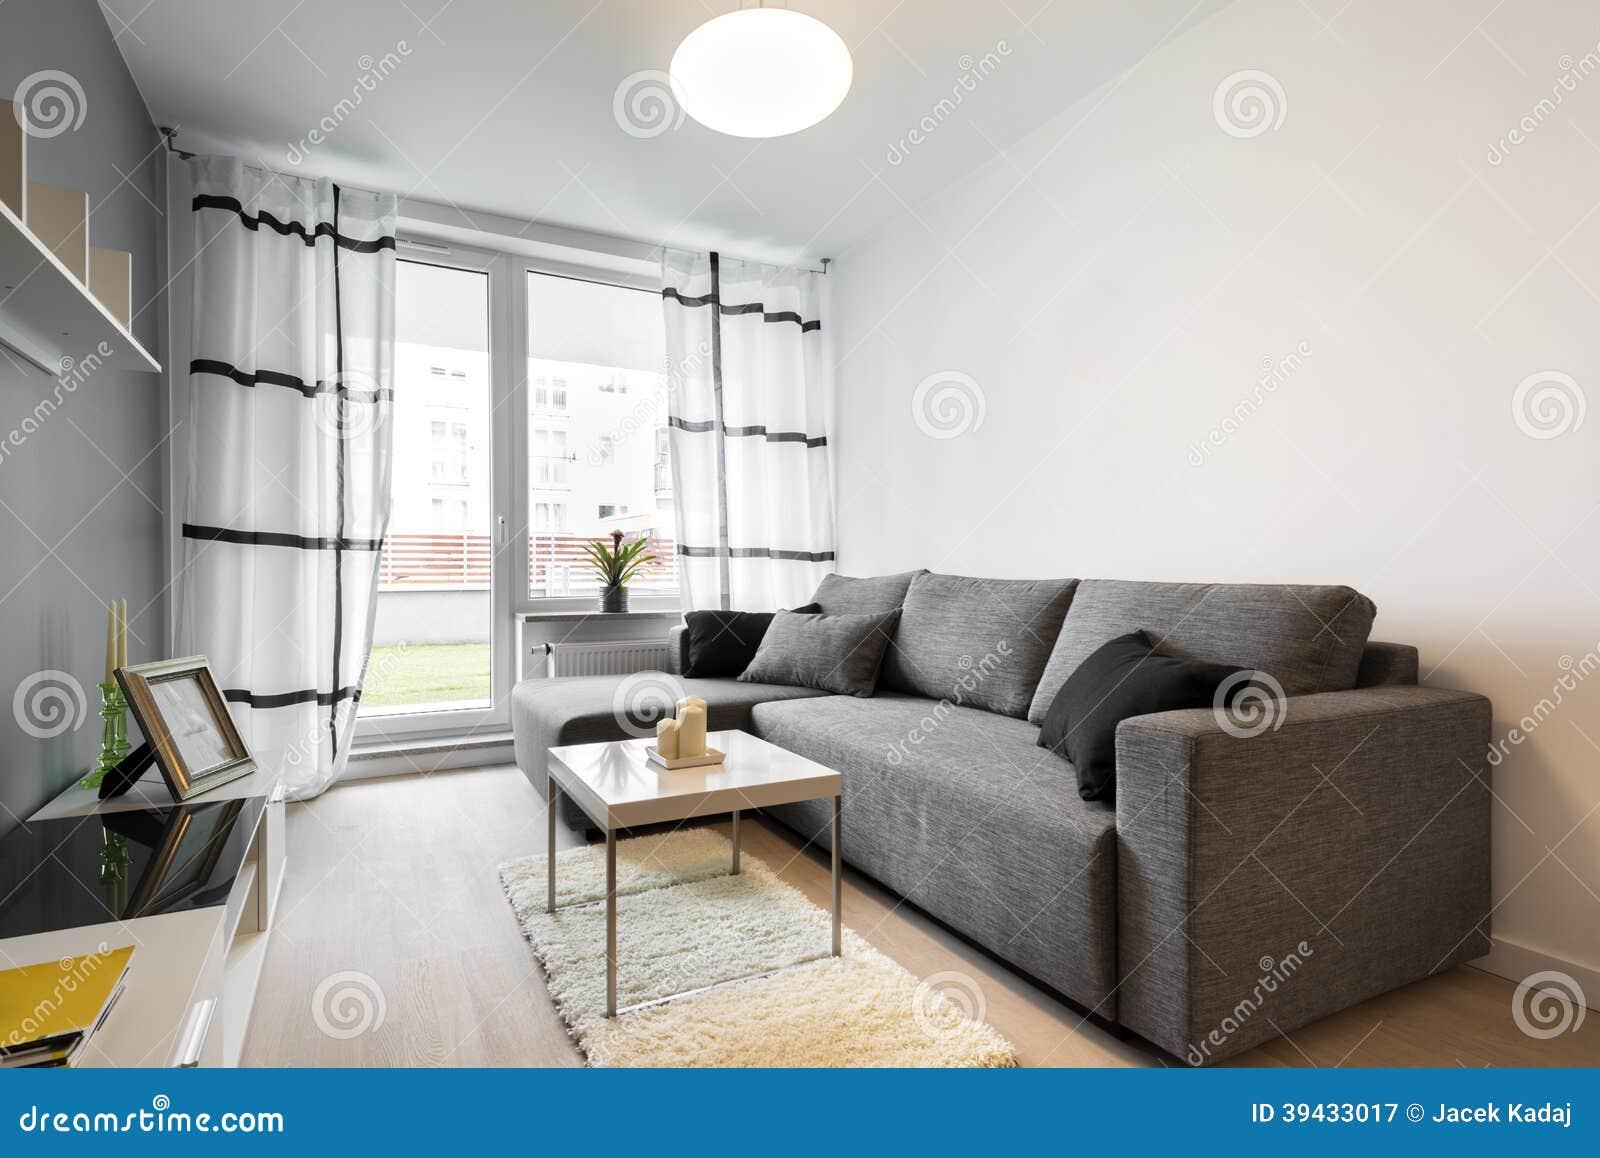 Grijze bank in moderne woonkamer stock afbeelding afbeelding 39433017 - Moderne eetkamer en woonkamer ...